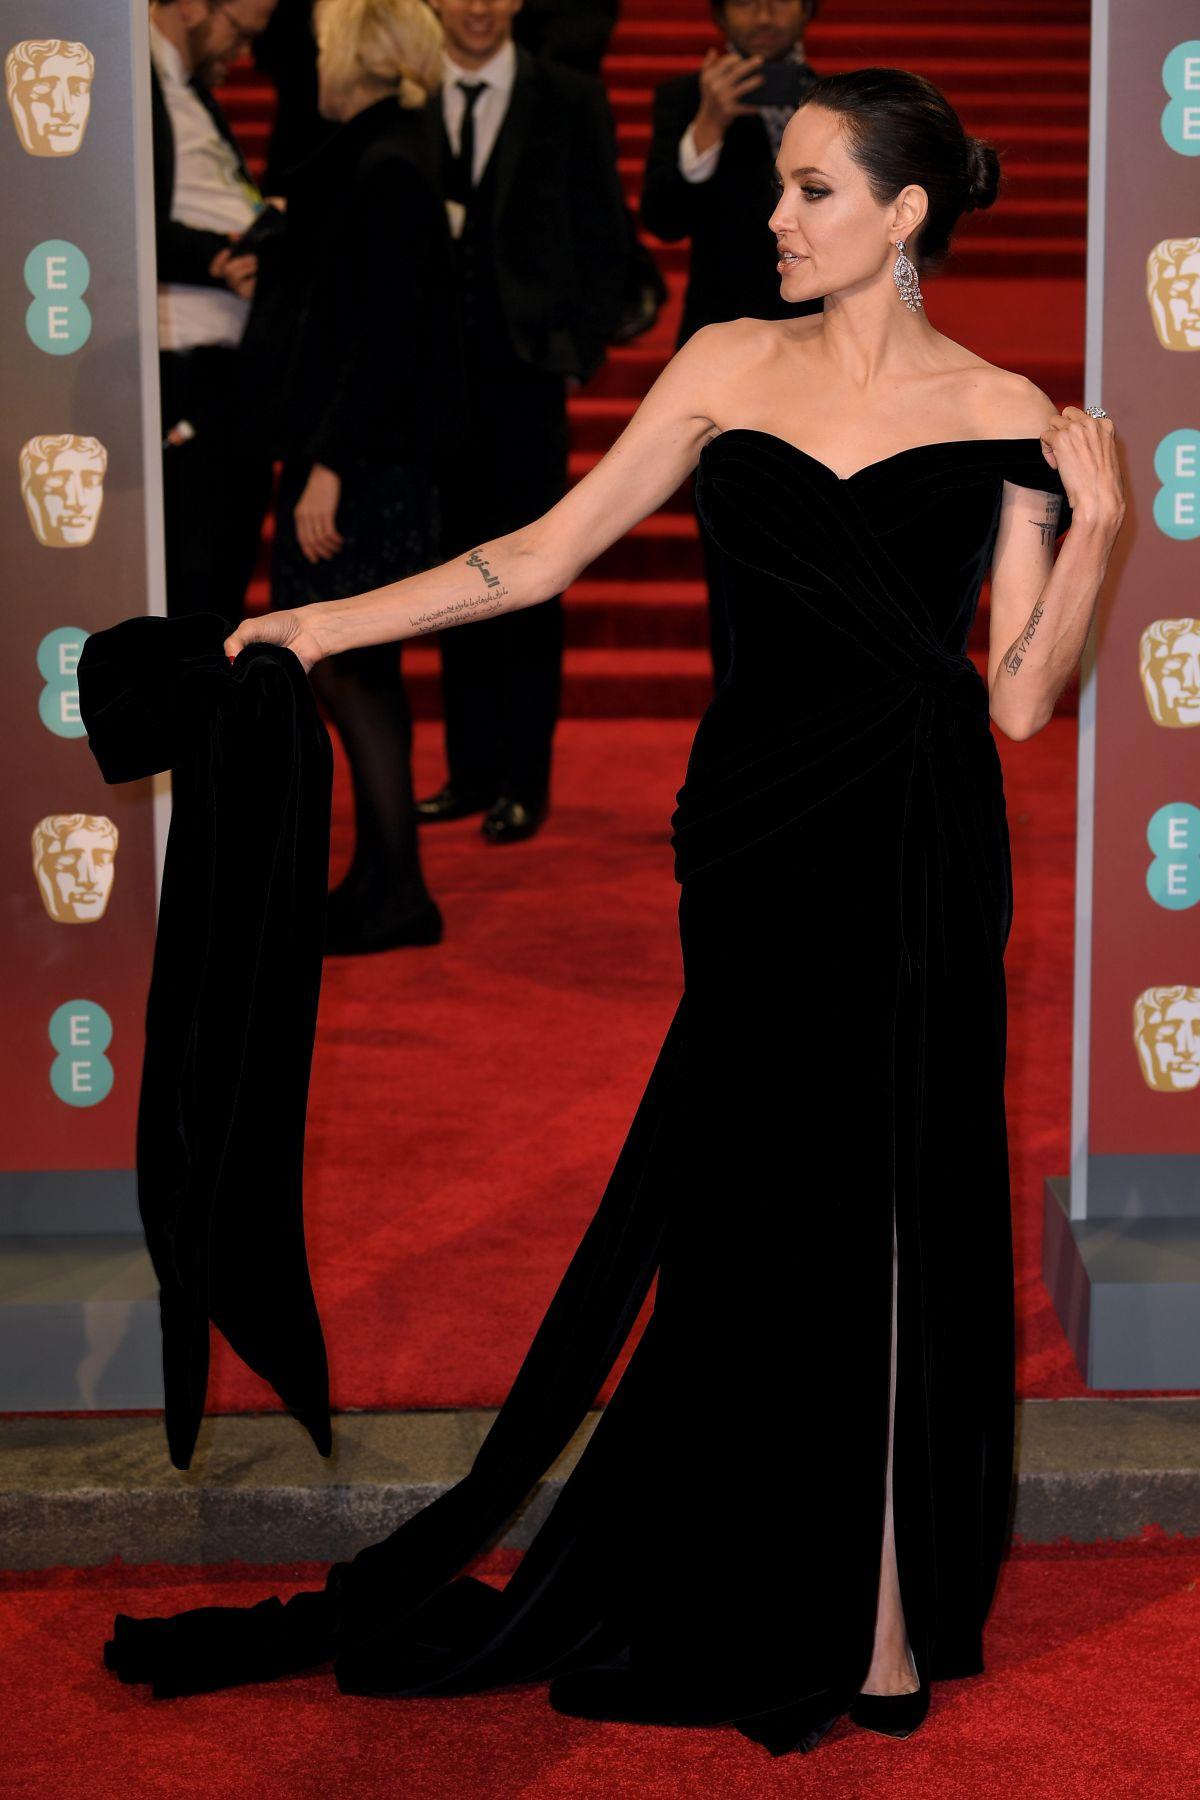 ANGELINA JOLIE at BAFTA Film Awards 2018 in London 02/18